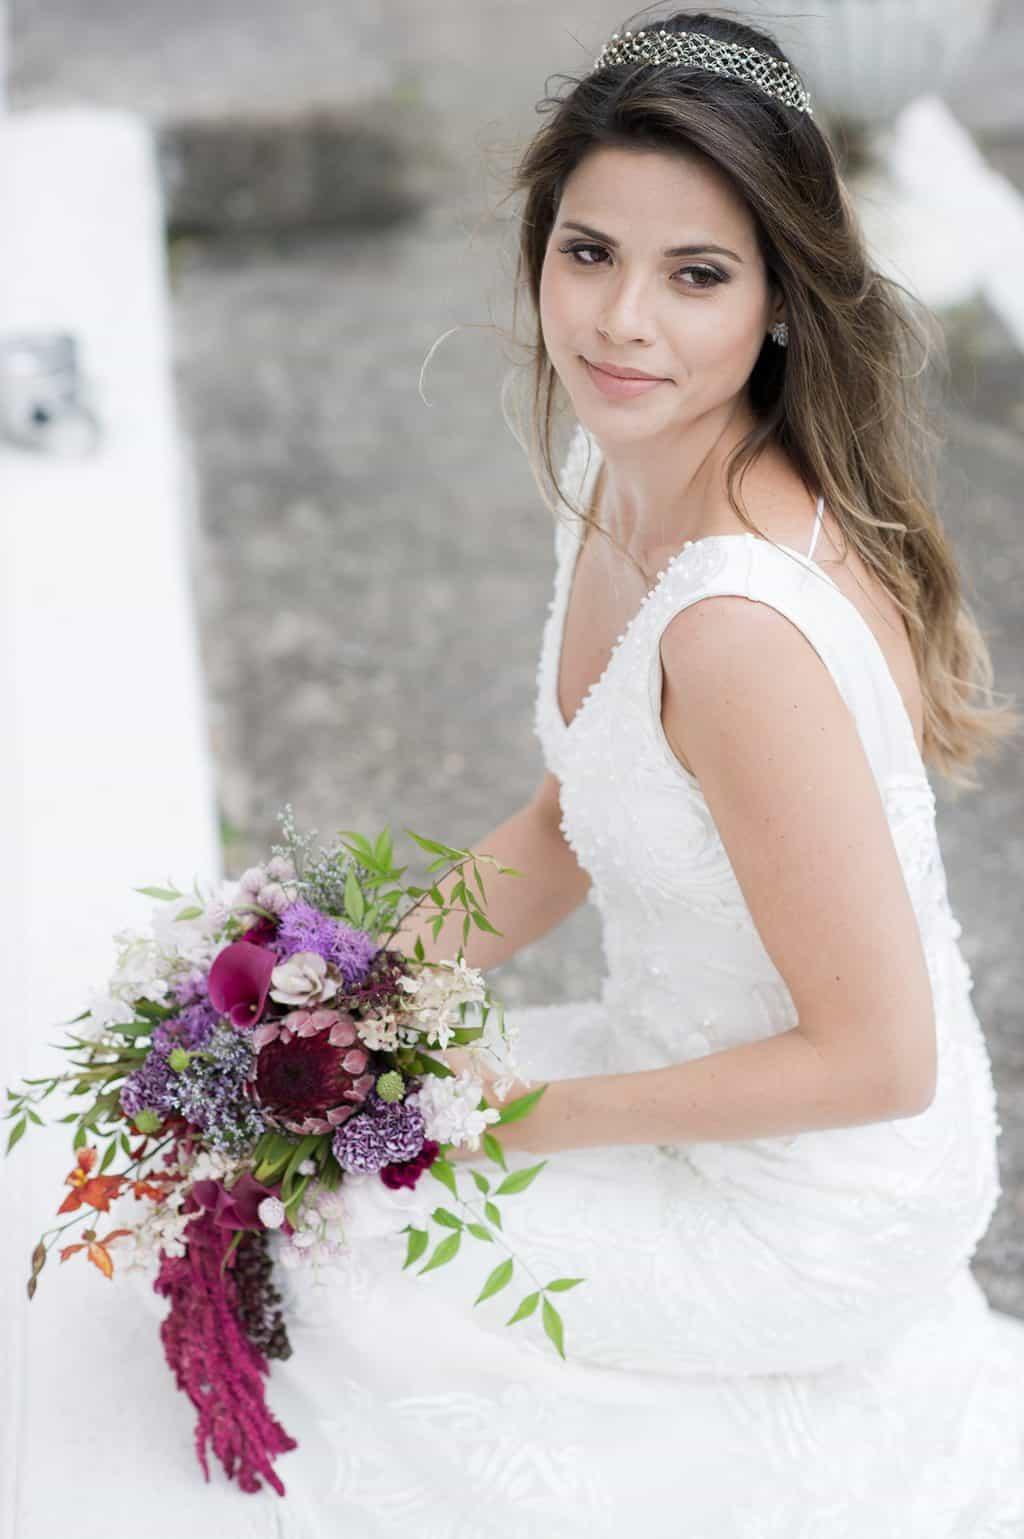 330_Maria-Ester-e-Candido_MF1_0282